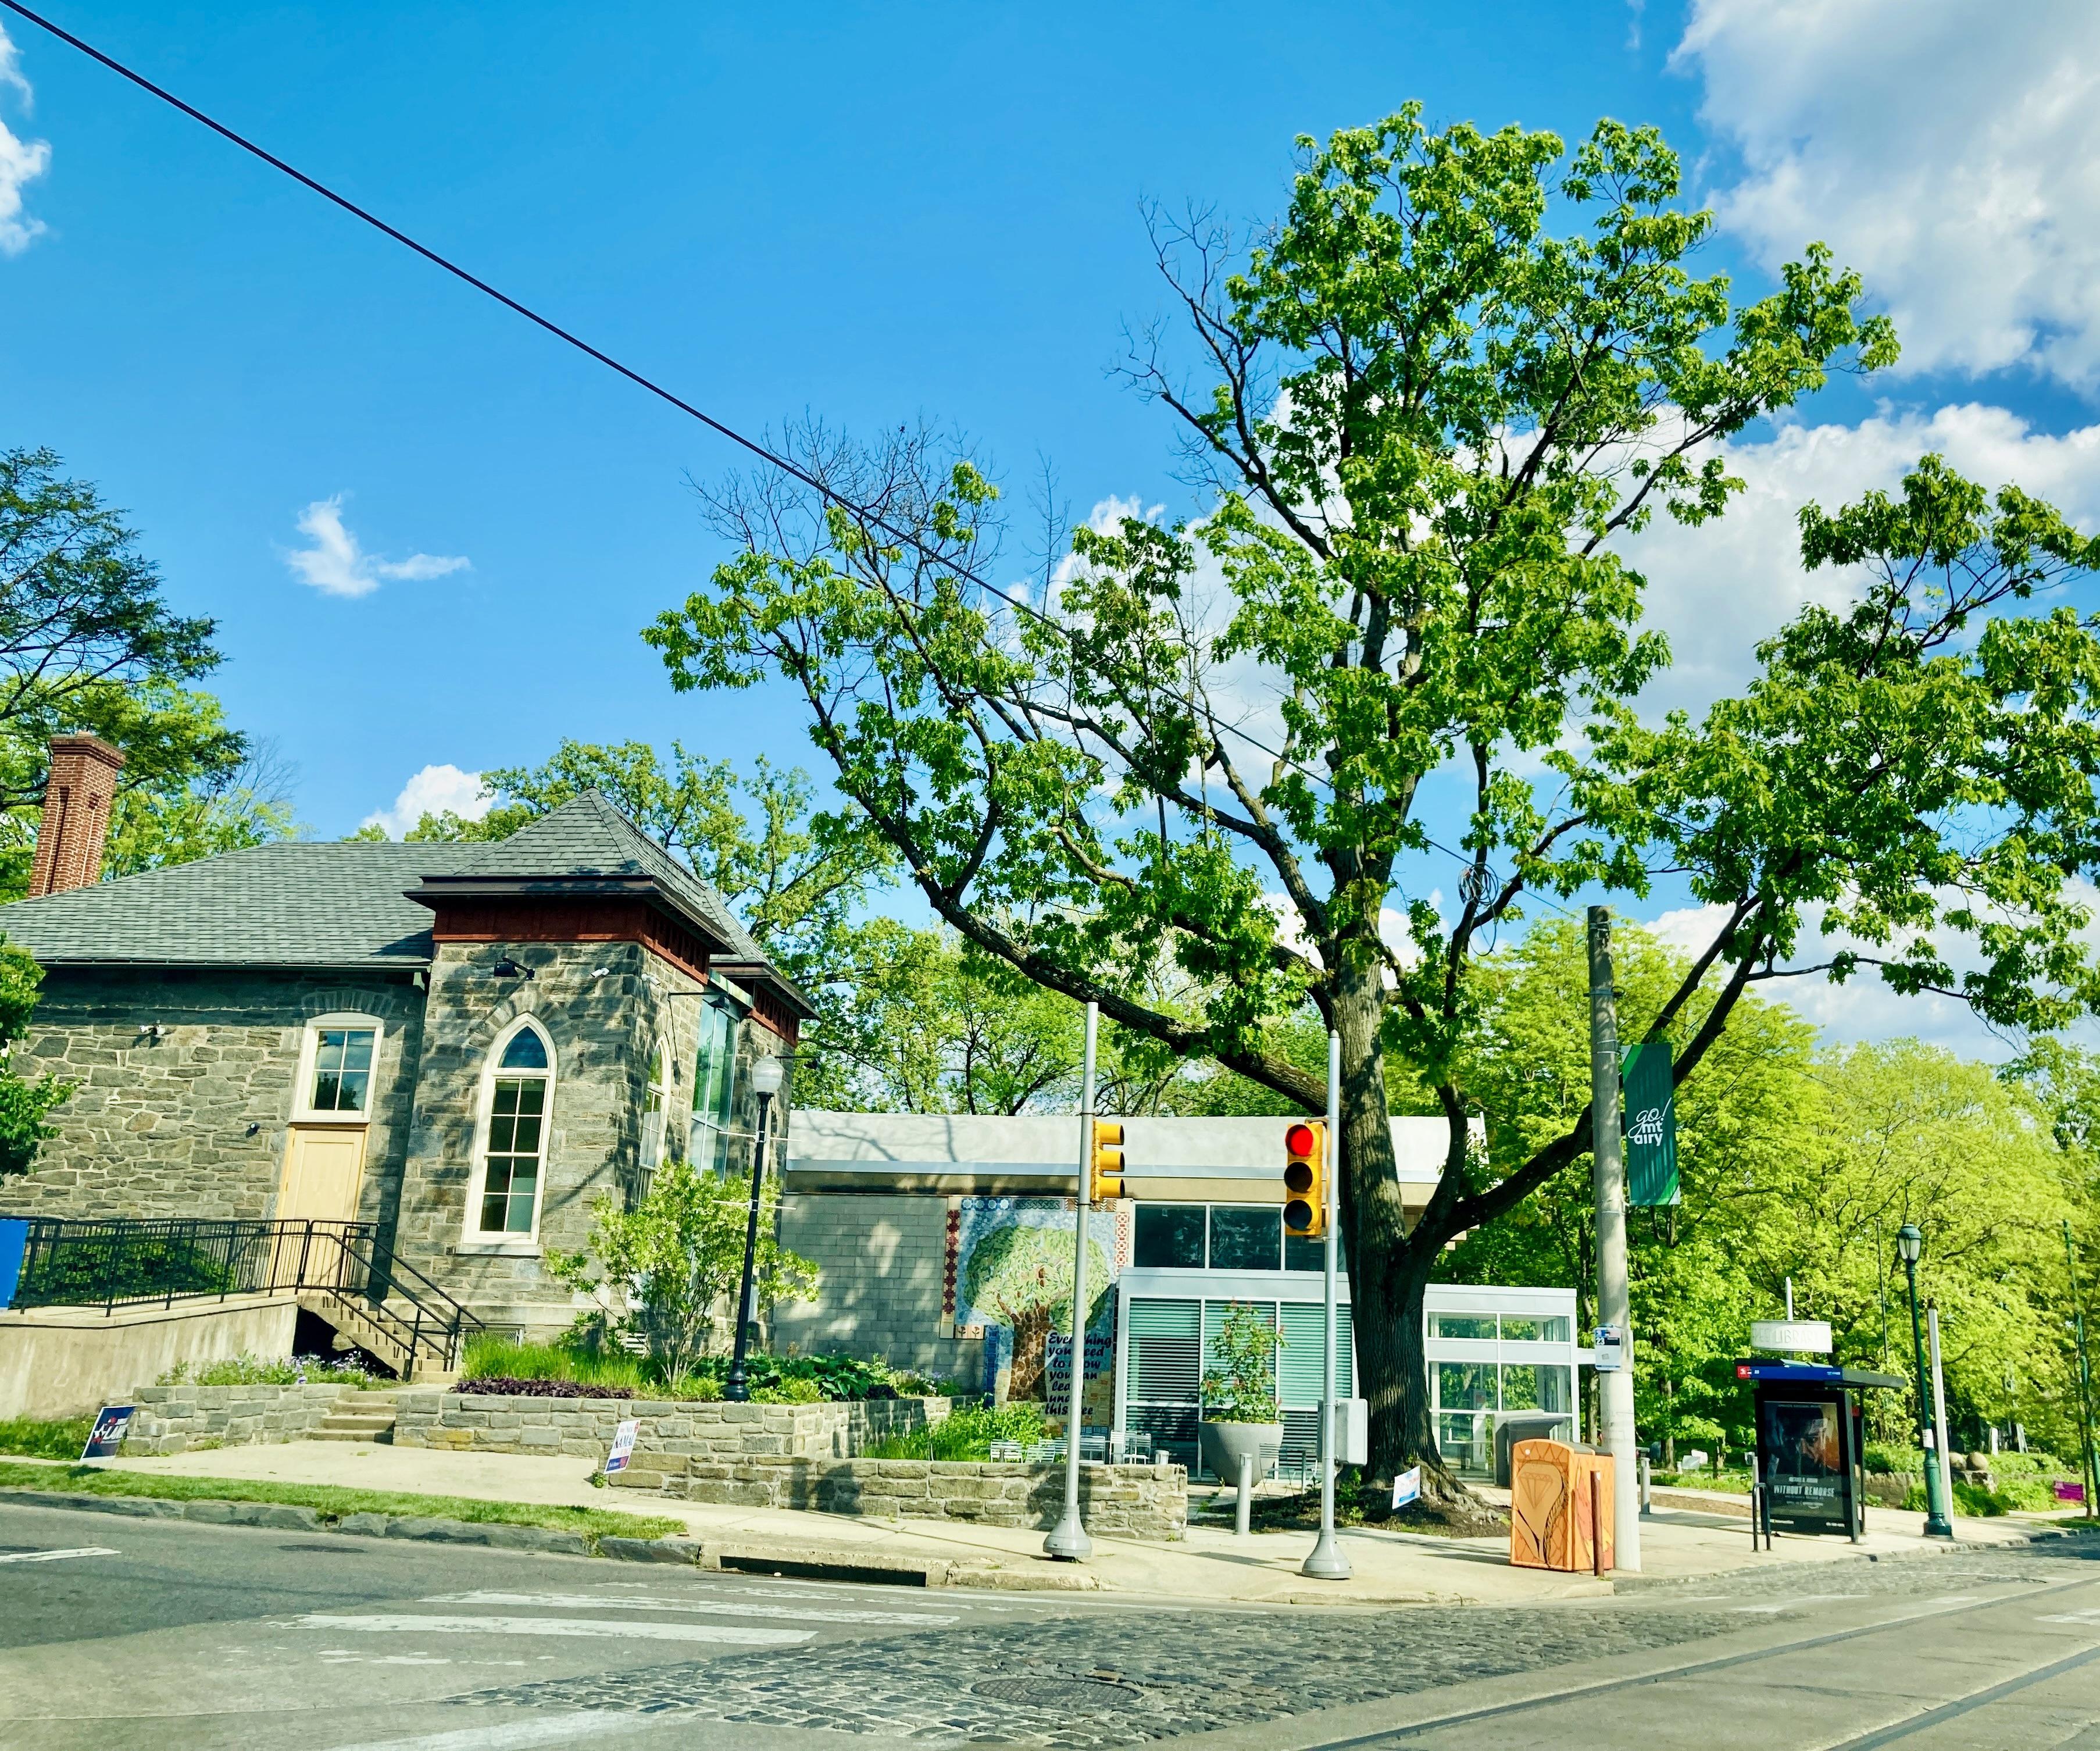 Mount Airy Free Library of Philadelphia